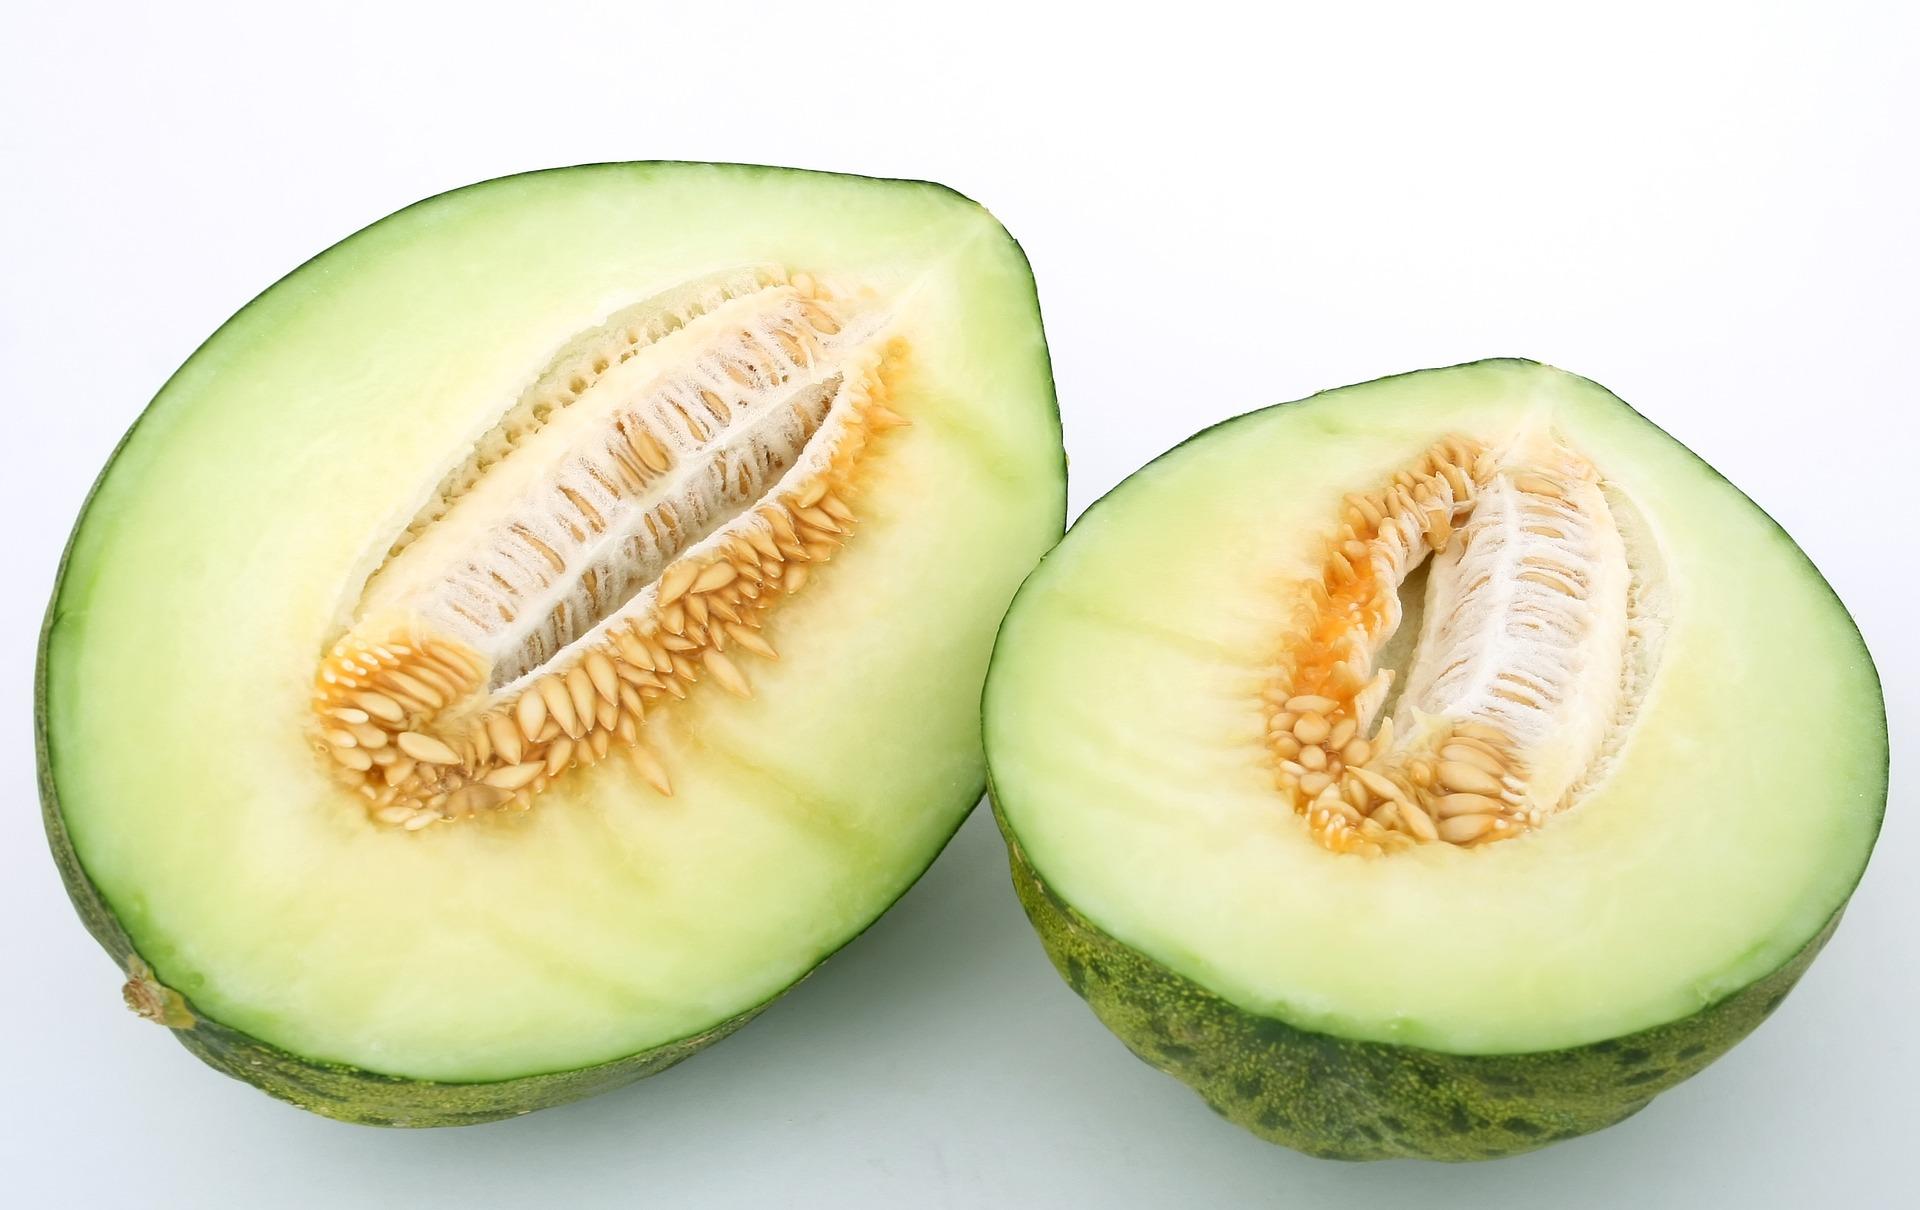 Biji melon ternyata memiliki khasiat yang mujarab, dijamin pasangan makin nempel. (foto: pixabay)